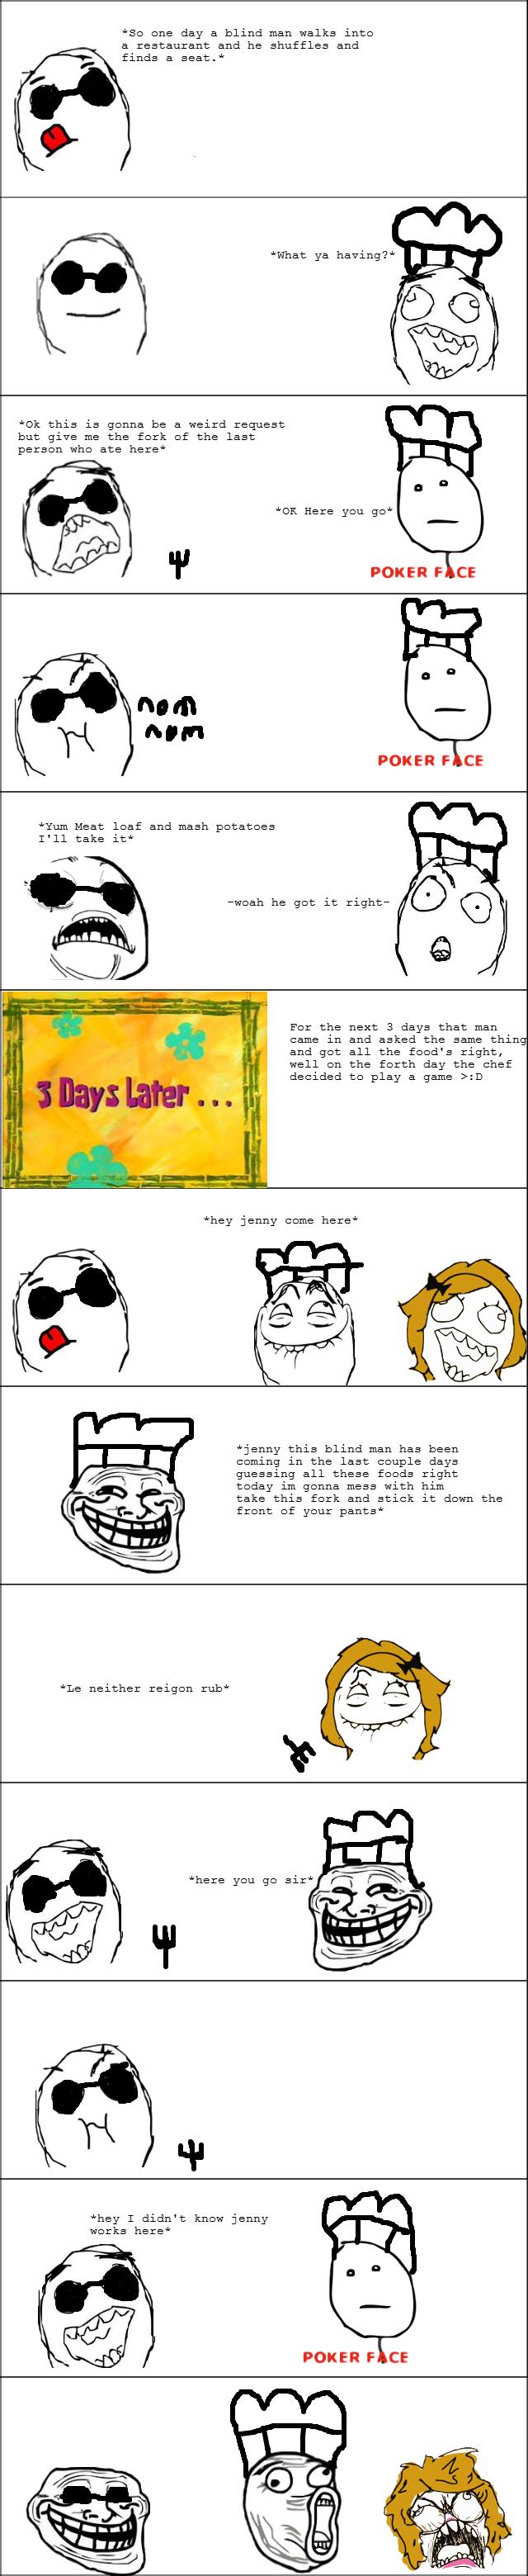 Tastes Like Chicken. .. id rather read the joke as a joke instead of read it through a 9gag meme comic